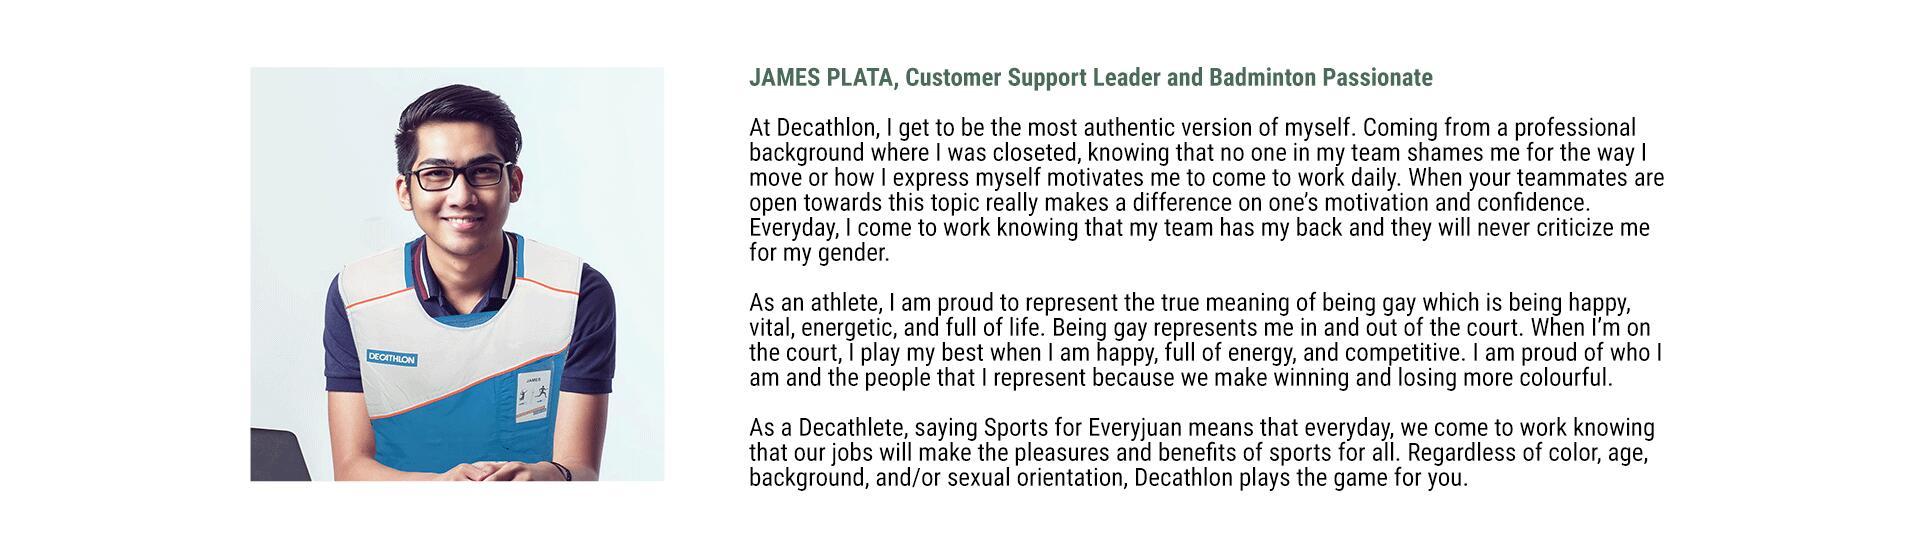 Decathlon Philippines Sustainability - James Plata